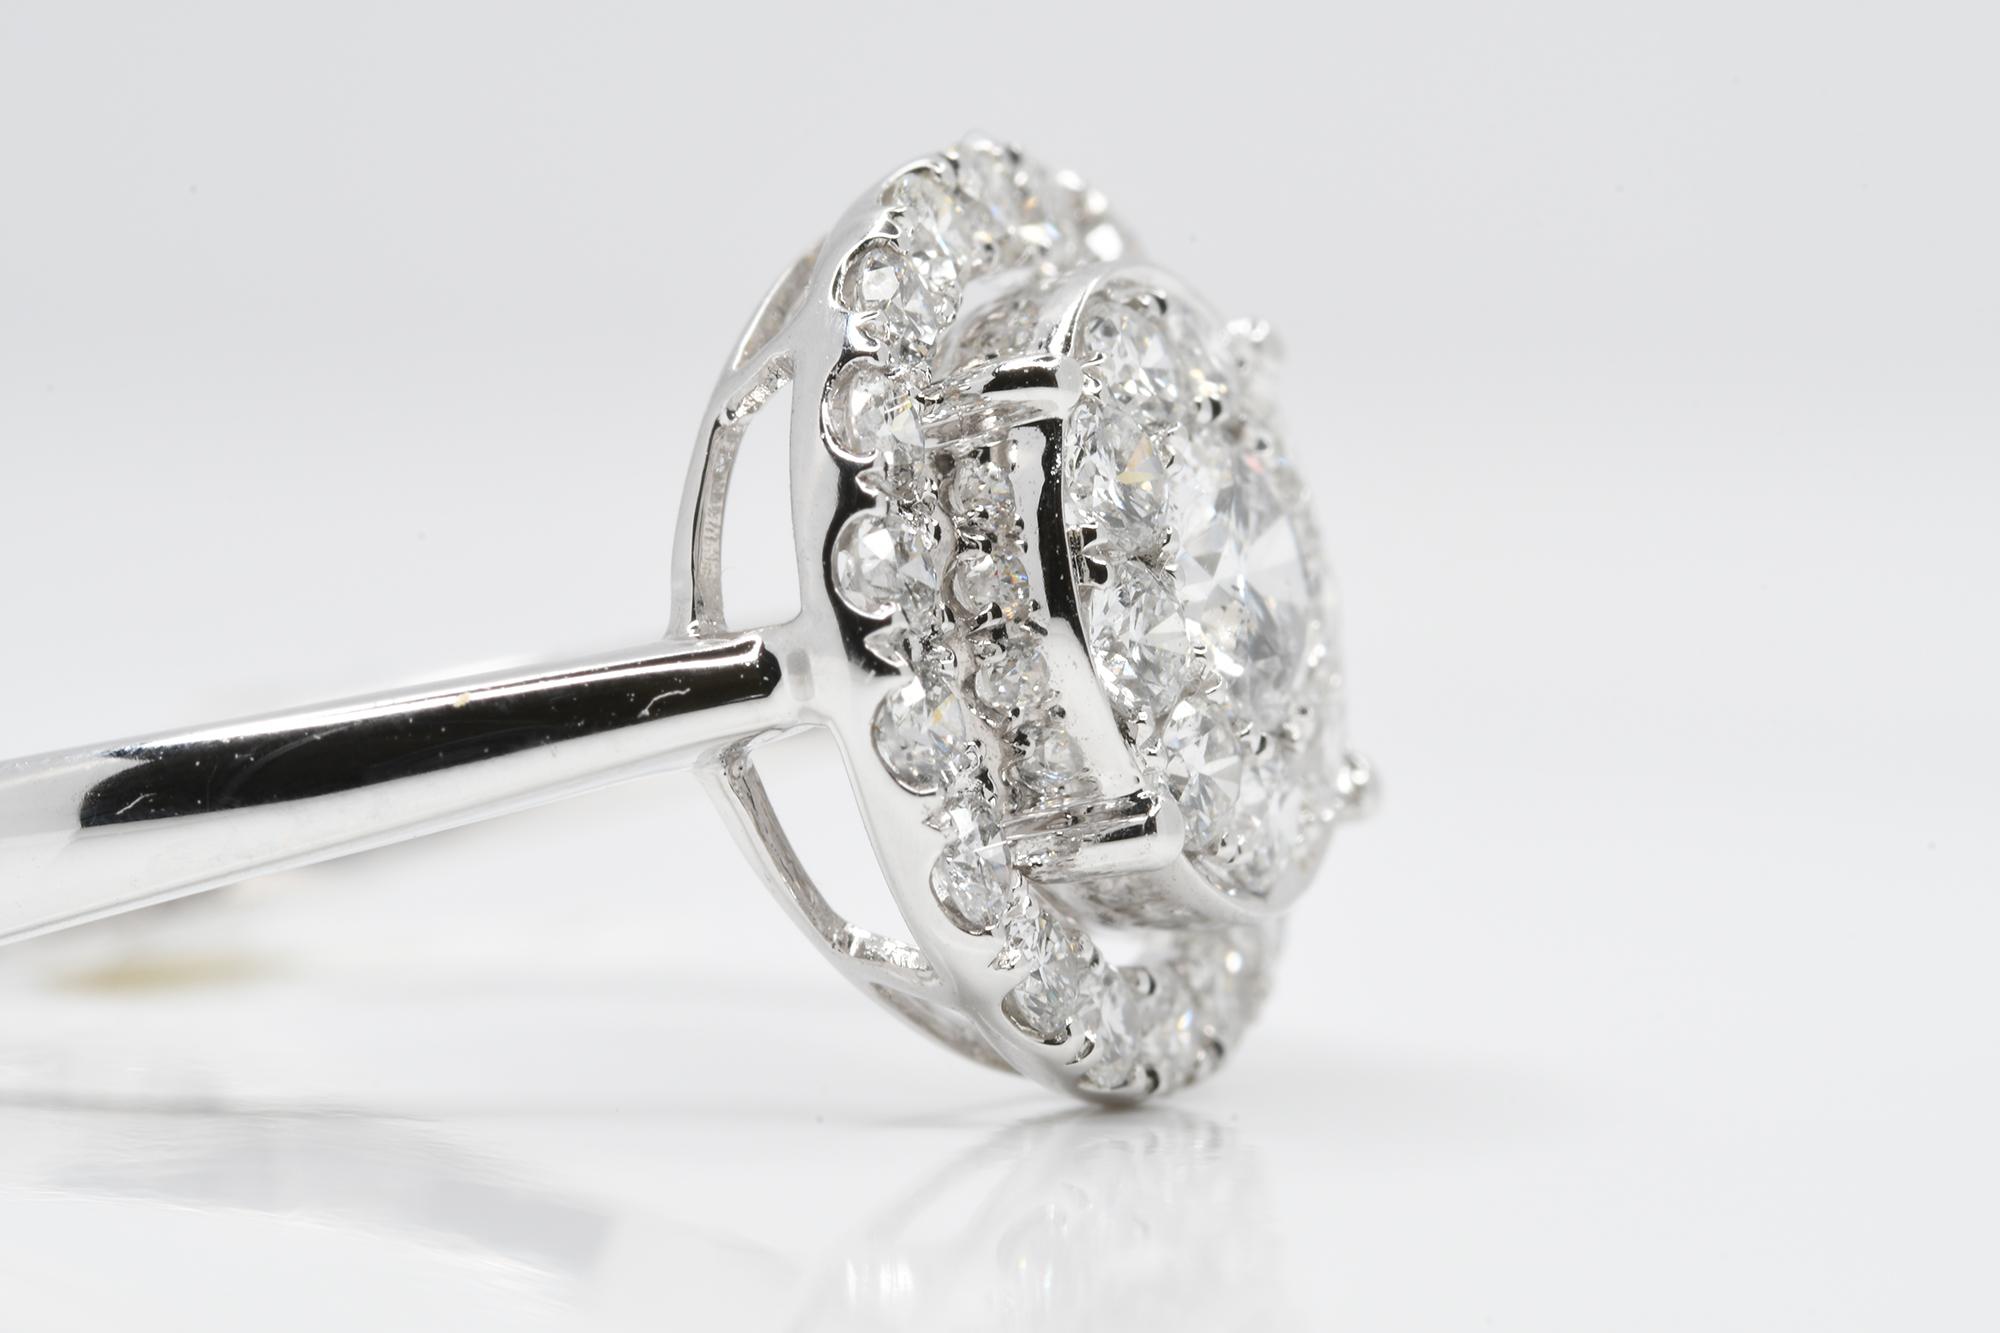 Diamond Ring - Image 3 of 5